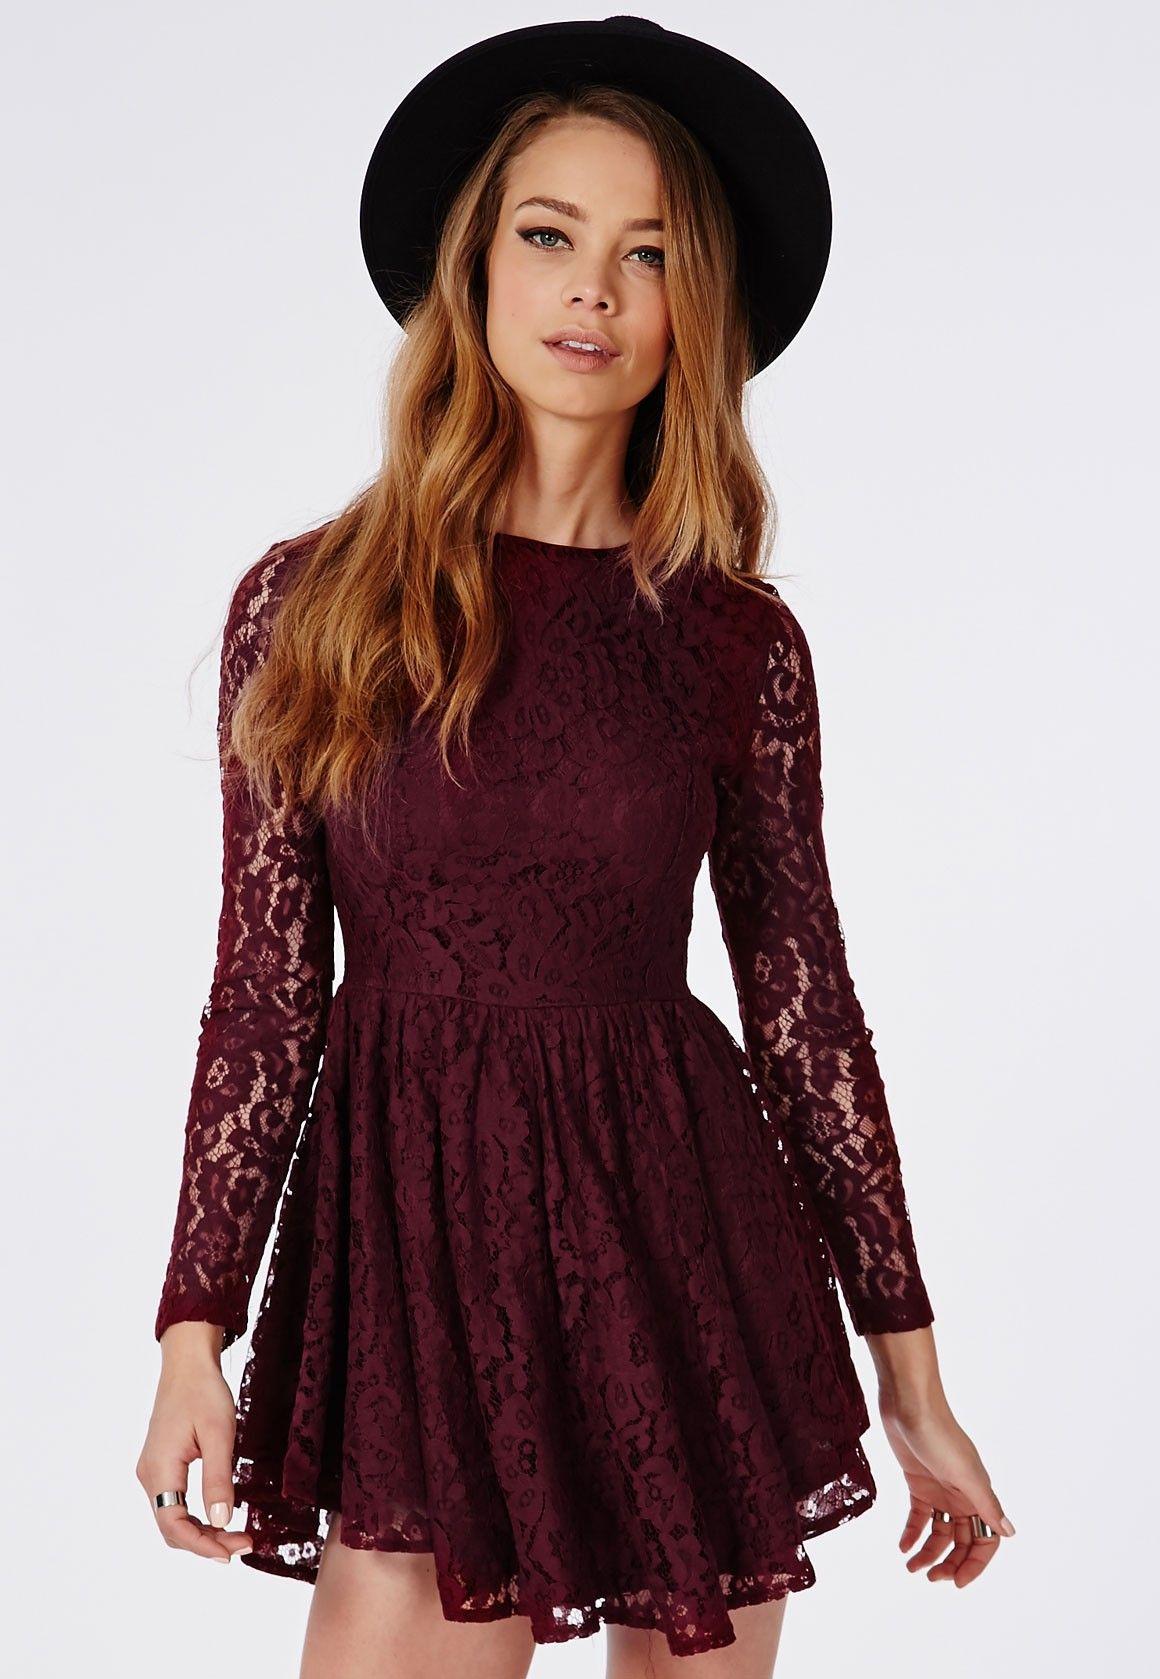 9001b47bc2 Curve Hem Lace Skater Dress Burgundy - Dresses - Skater Dresses - Missguided